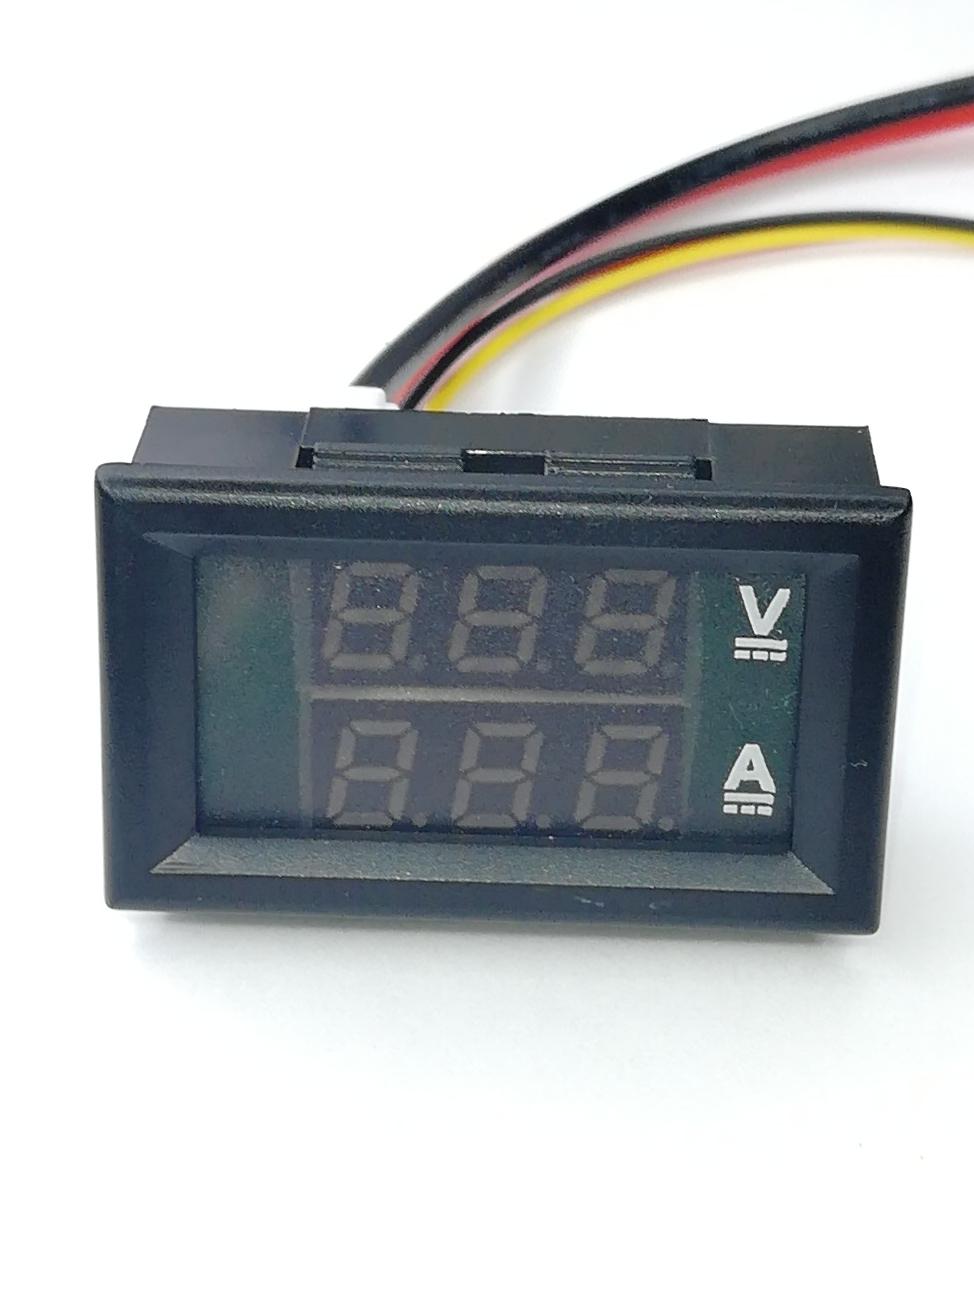 Вольтметр-амперметр DSN-VC288HV 10А